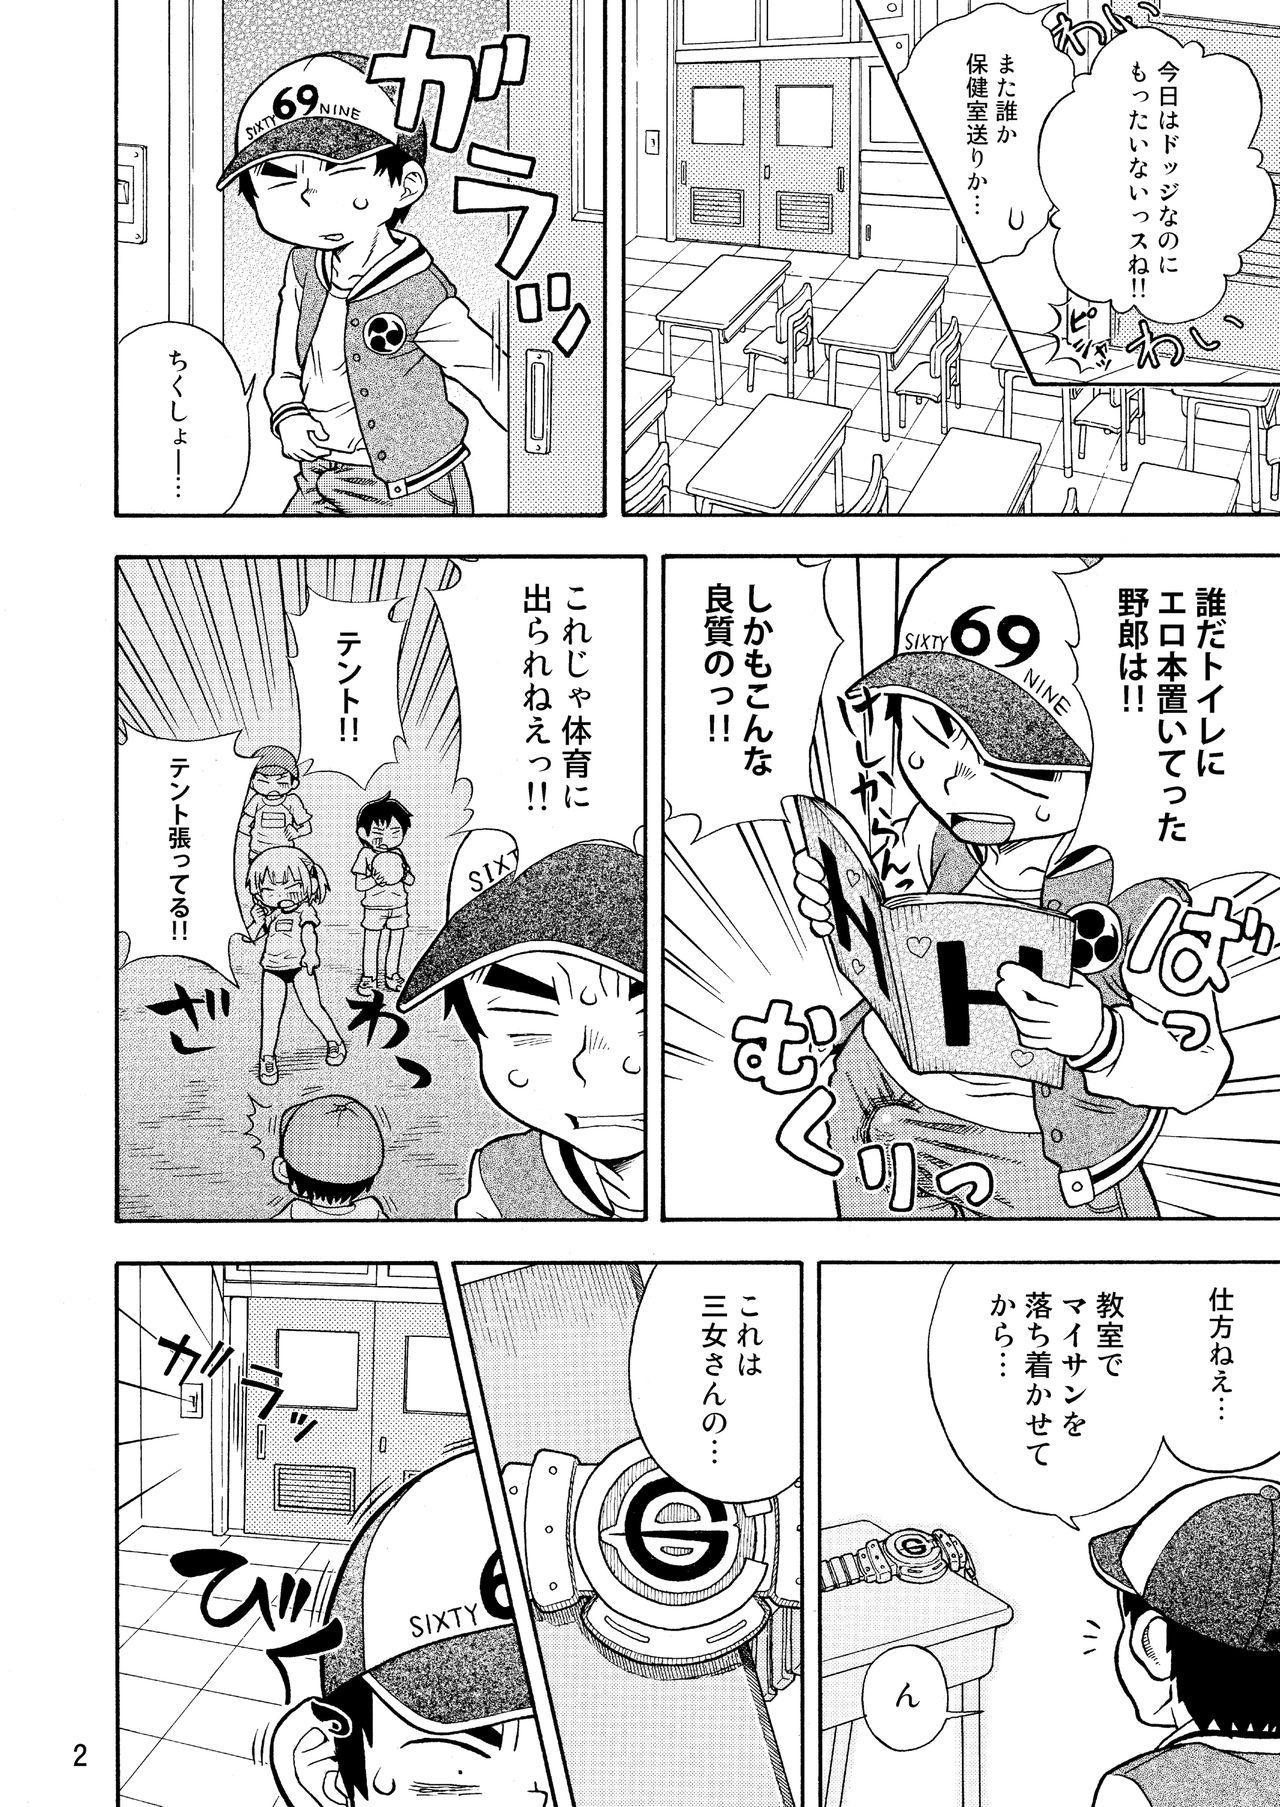 Mitsudomoe no Hiwai Hon 2